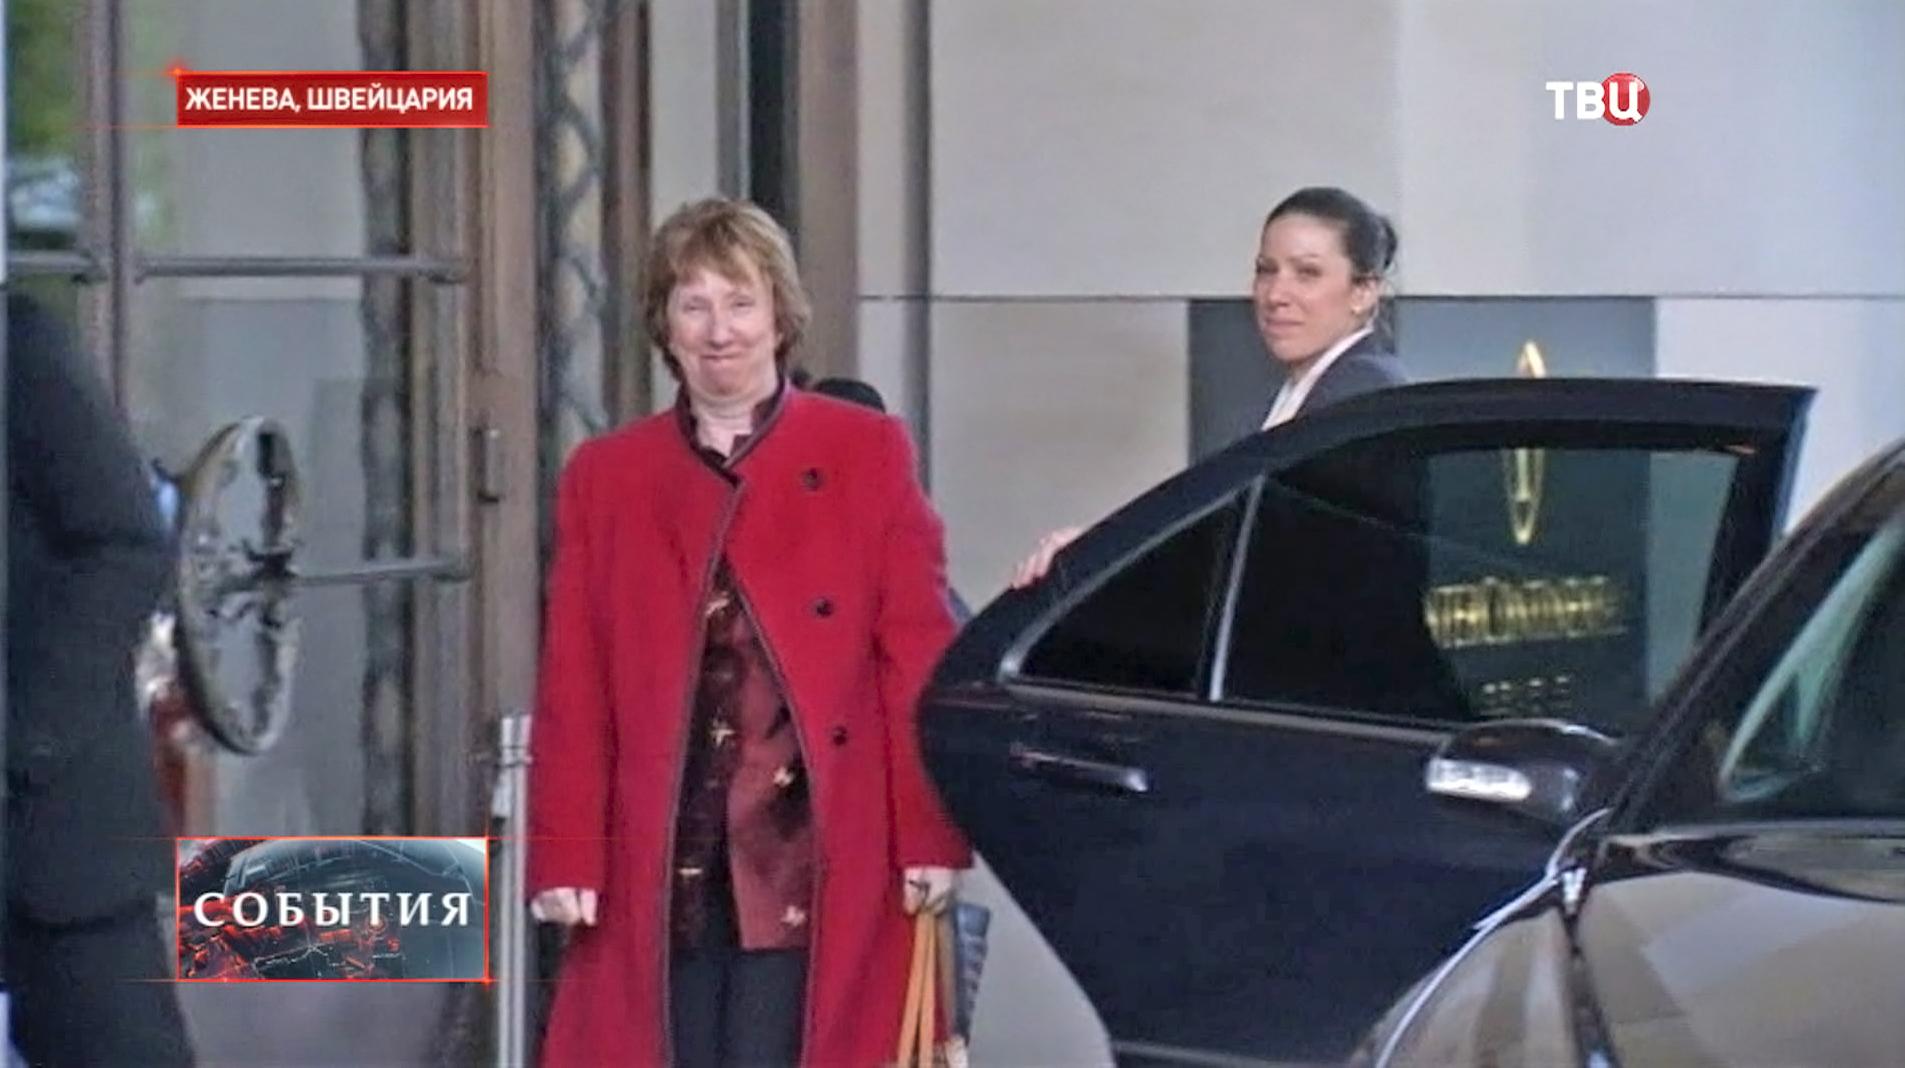 Глава дипломатии Евросоюза Кэтрин Эштон